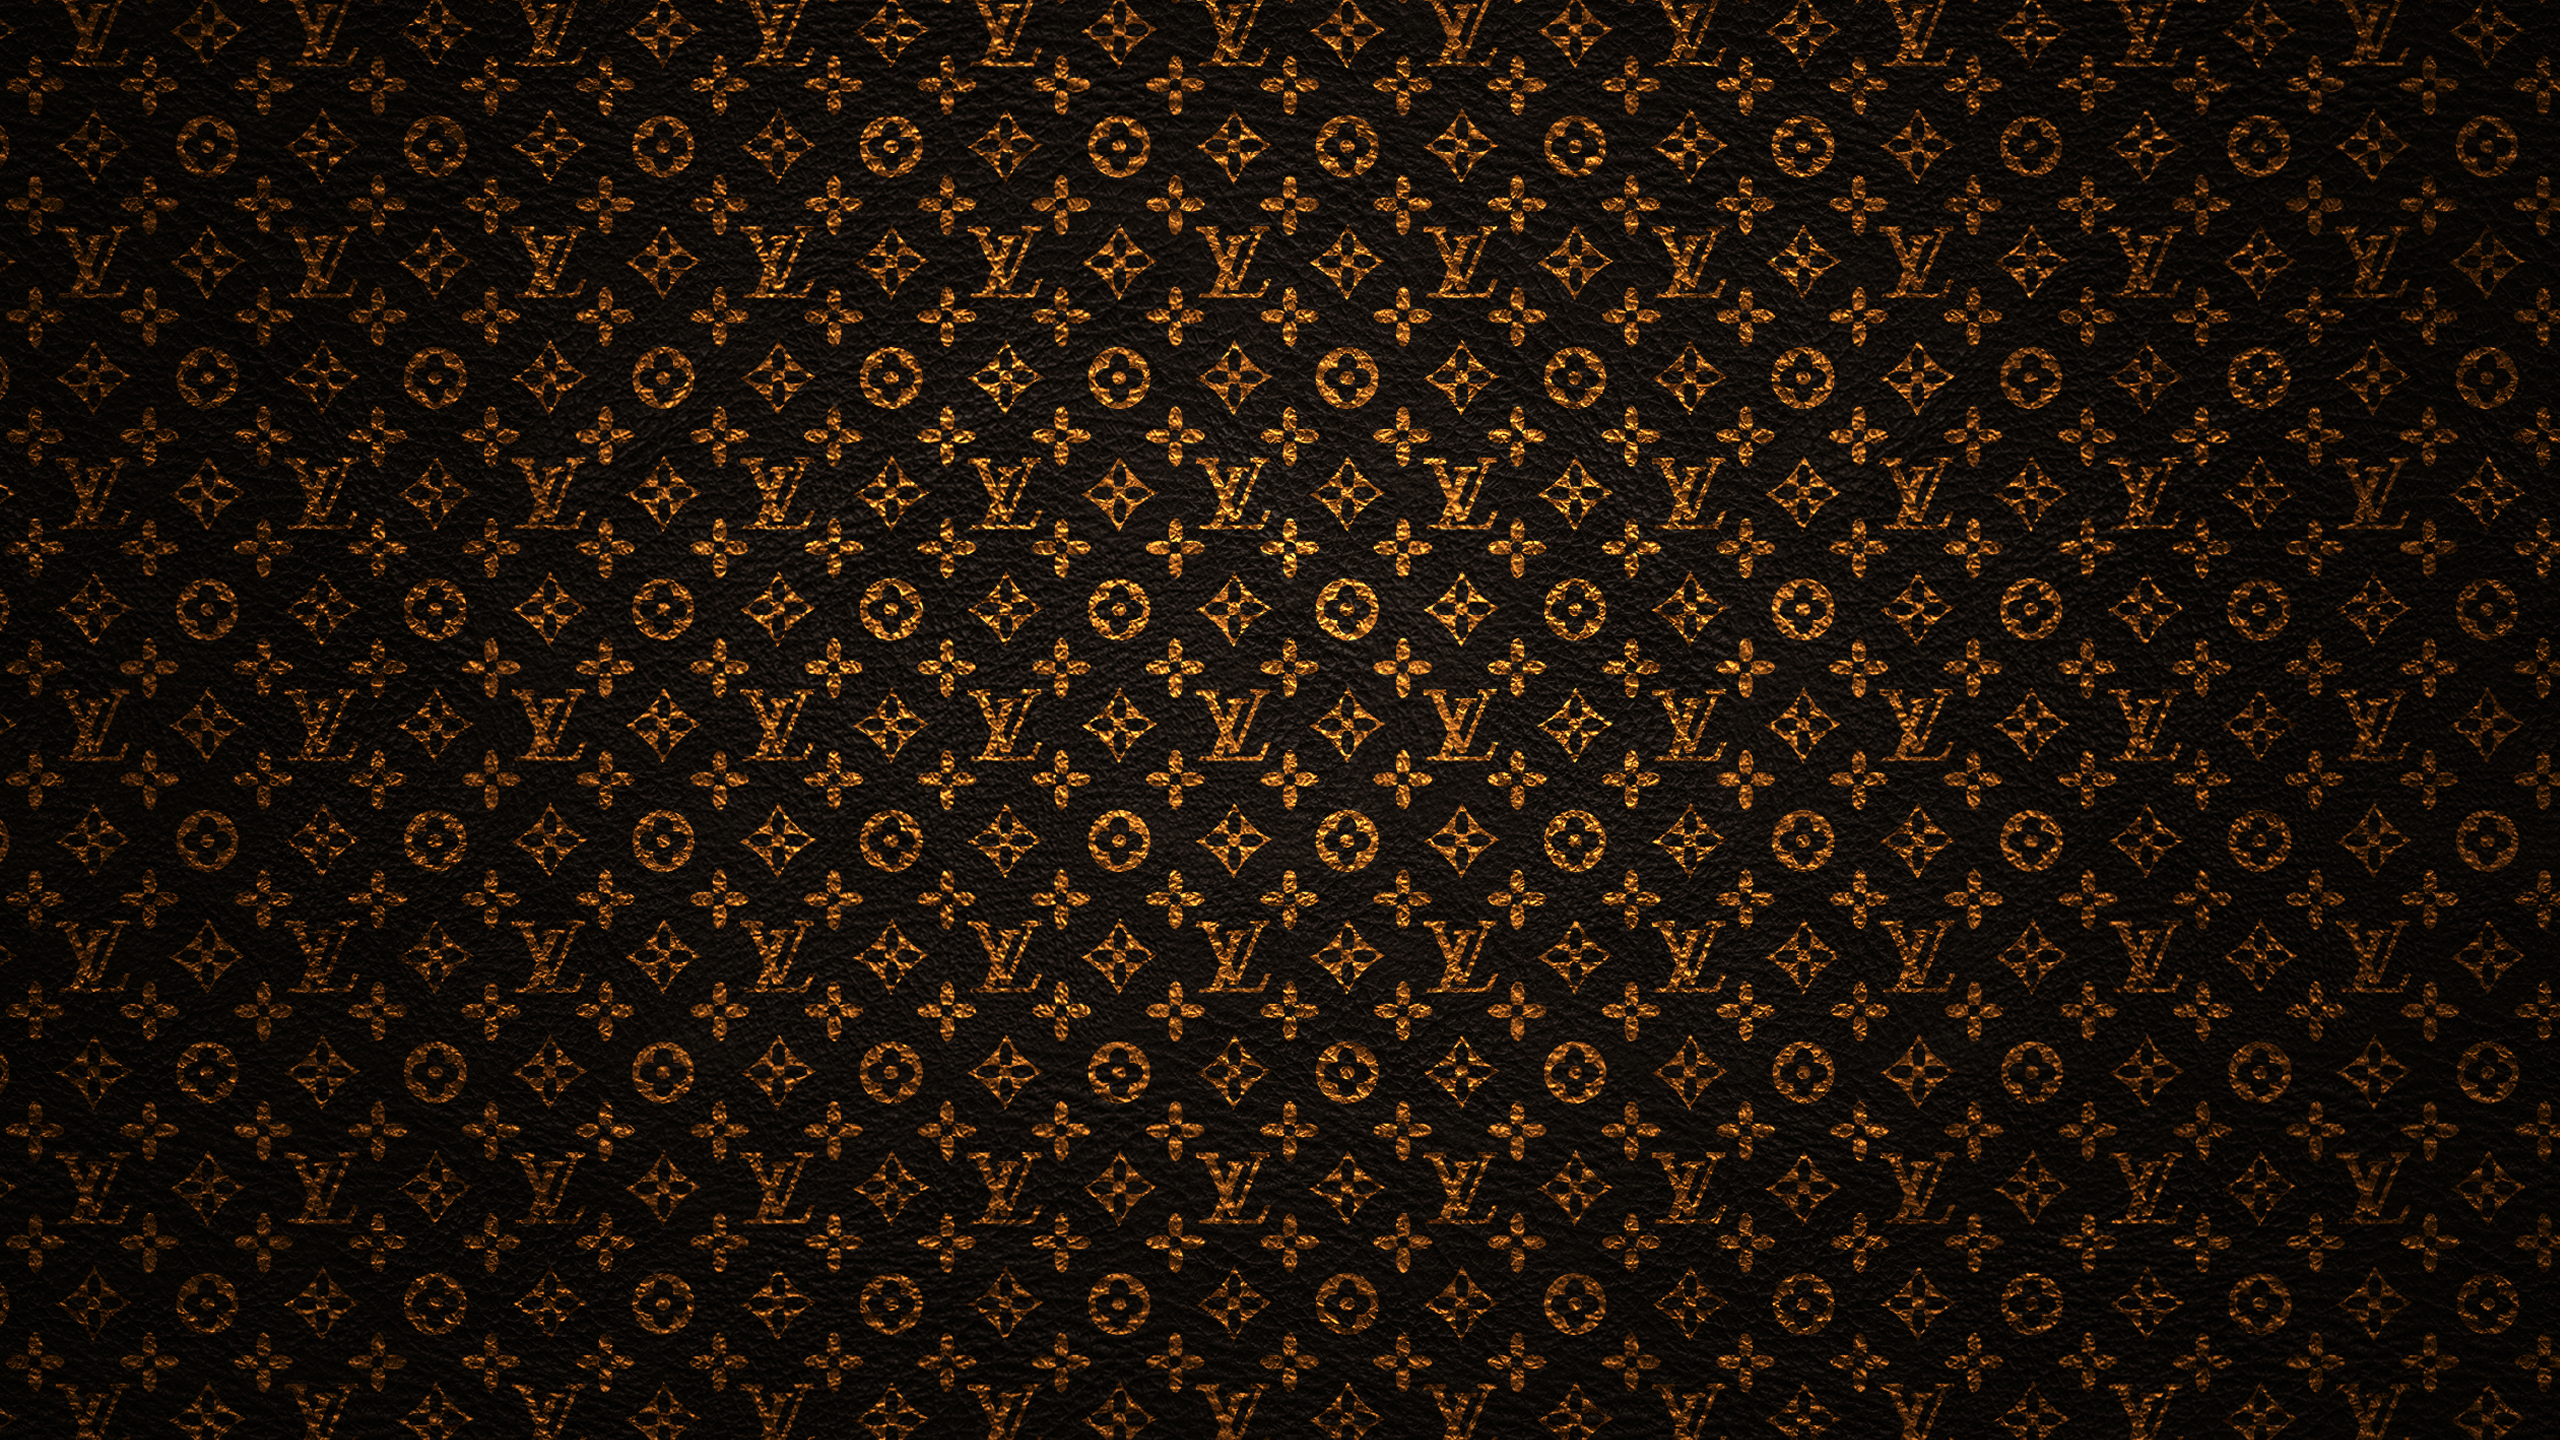 Louis Vuitton wallpaper | 2560x1440